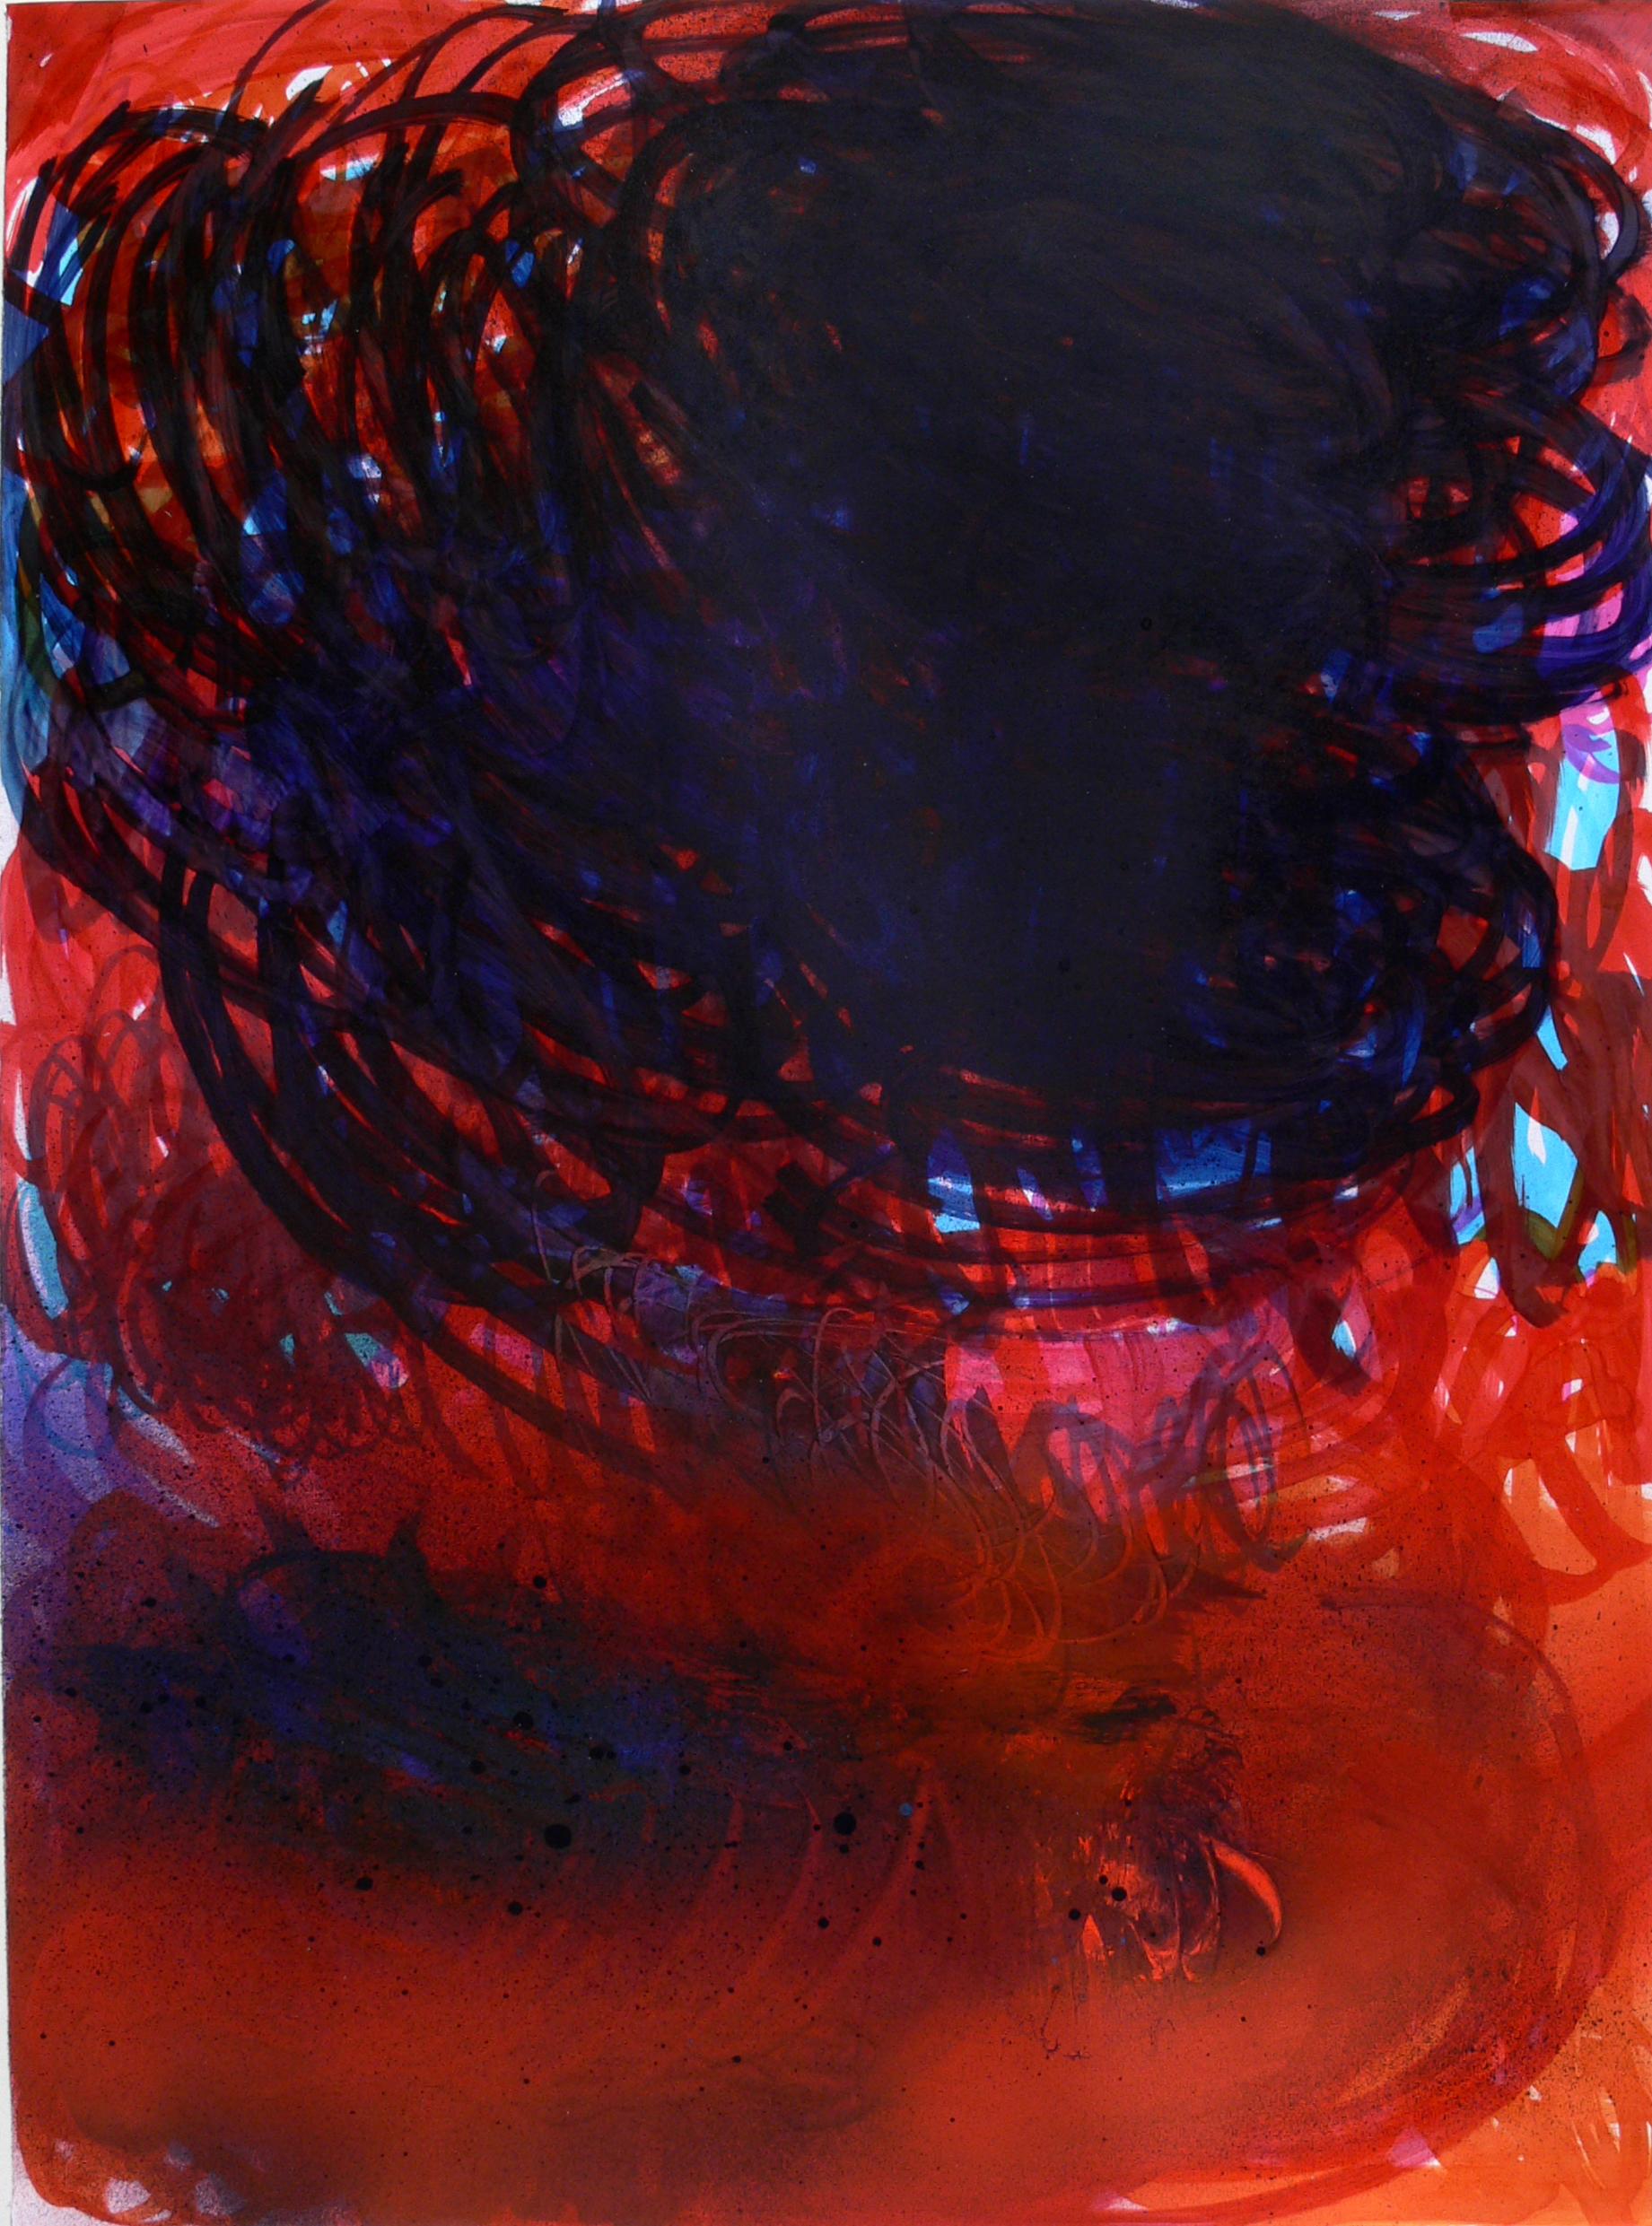 © Udo Rathke, Inferno #3